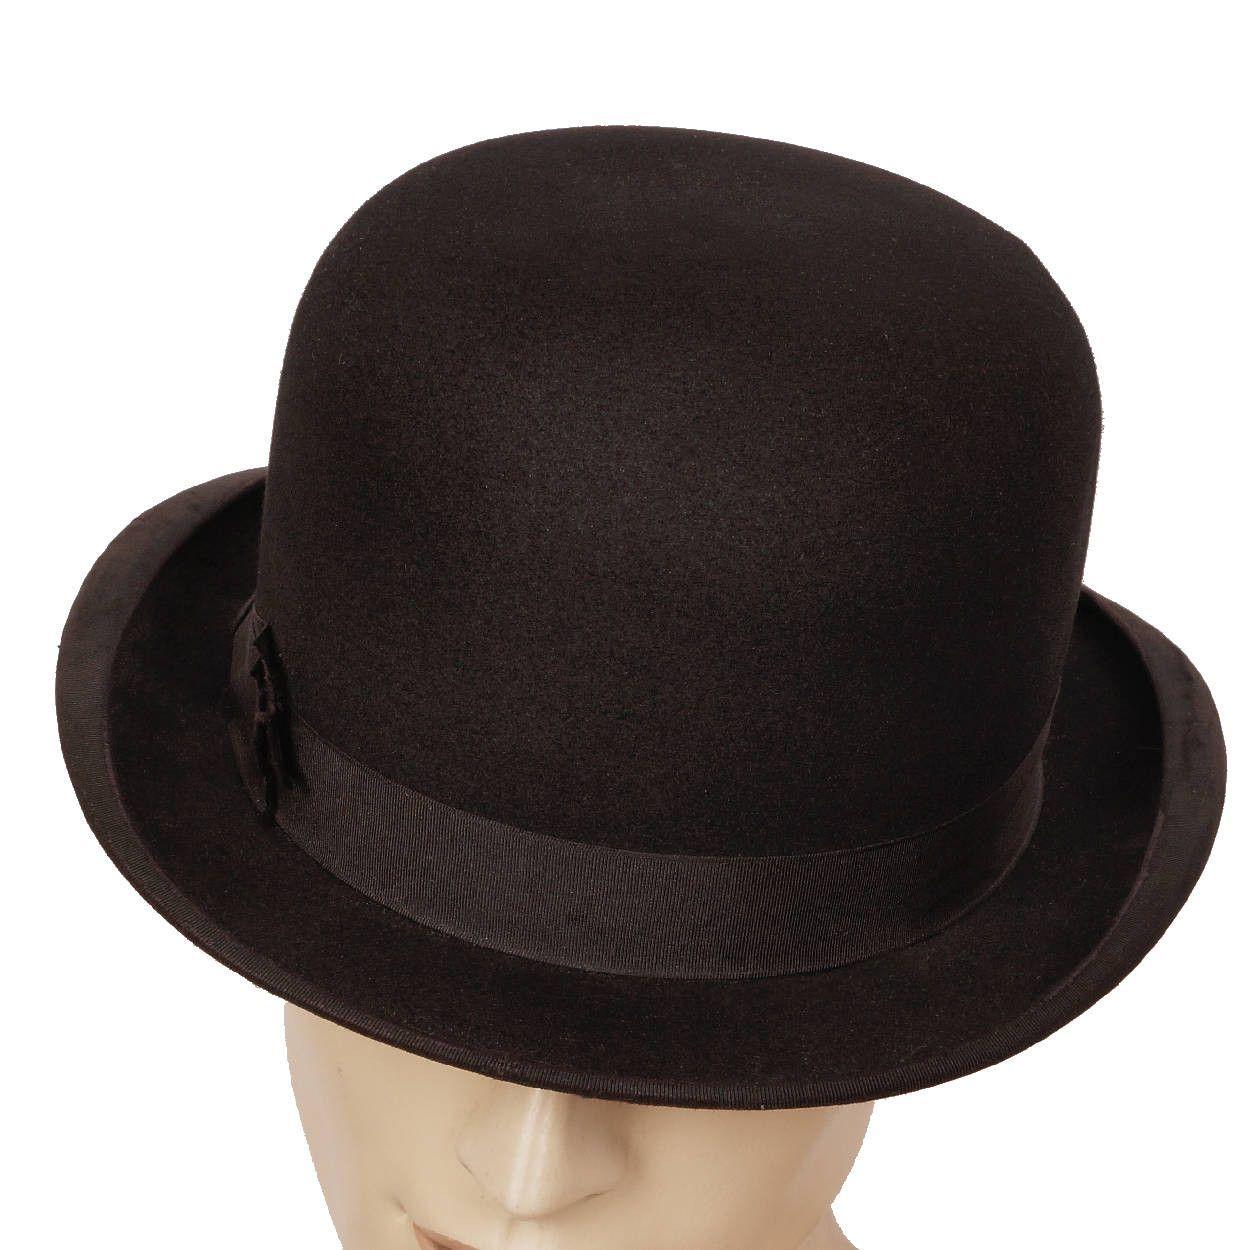 fd5e2083 Vintage Mens English Bowler Derby Hat Ross & Co London XXL 7 3/4 ...